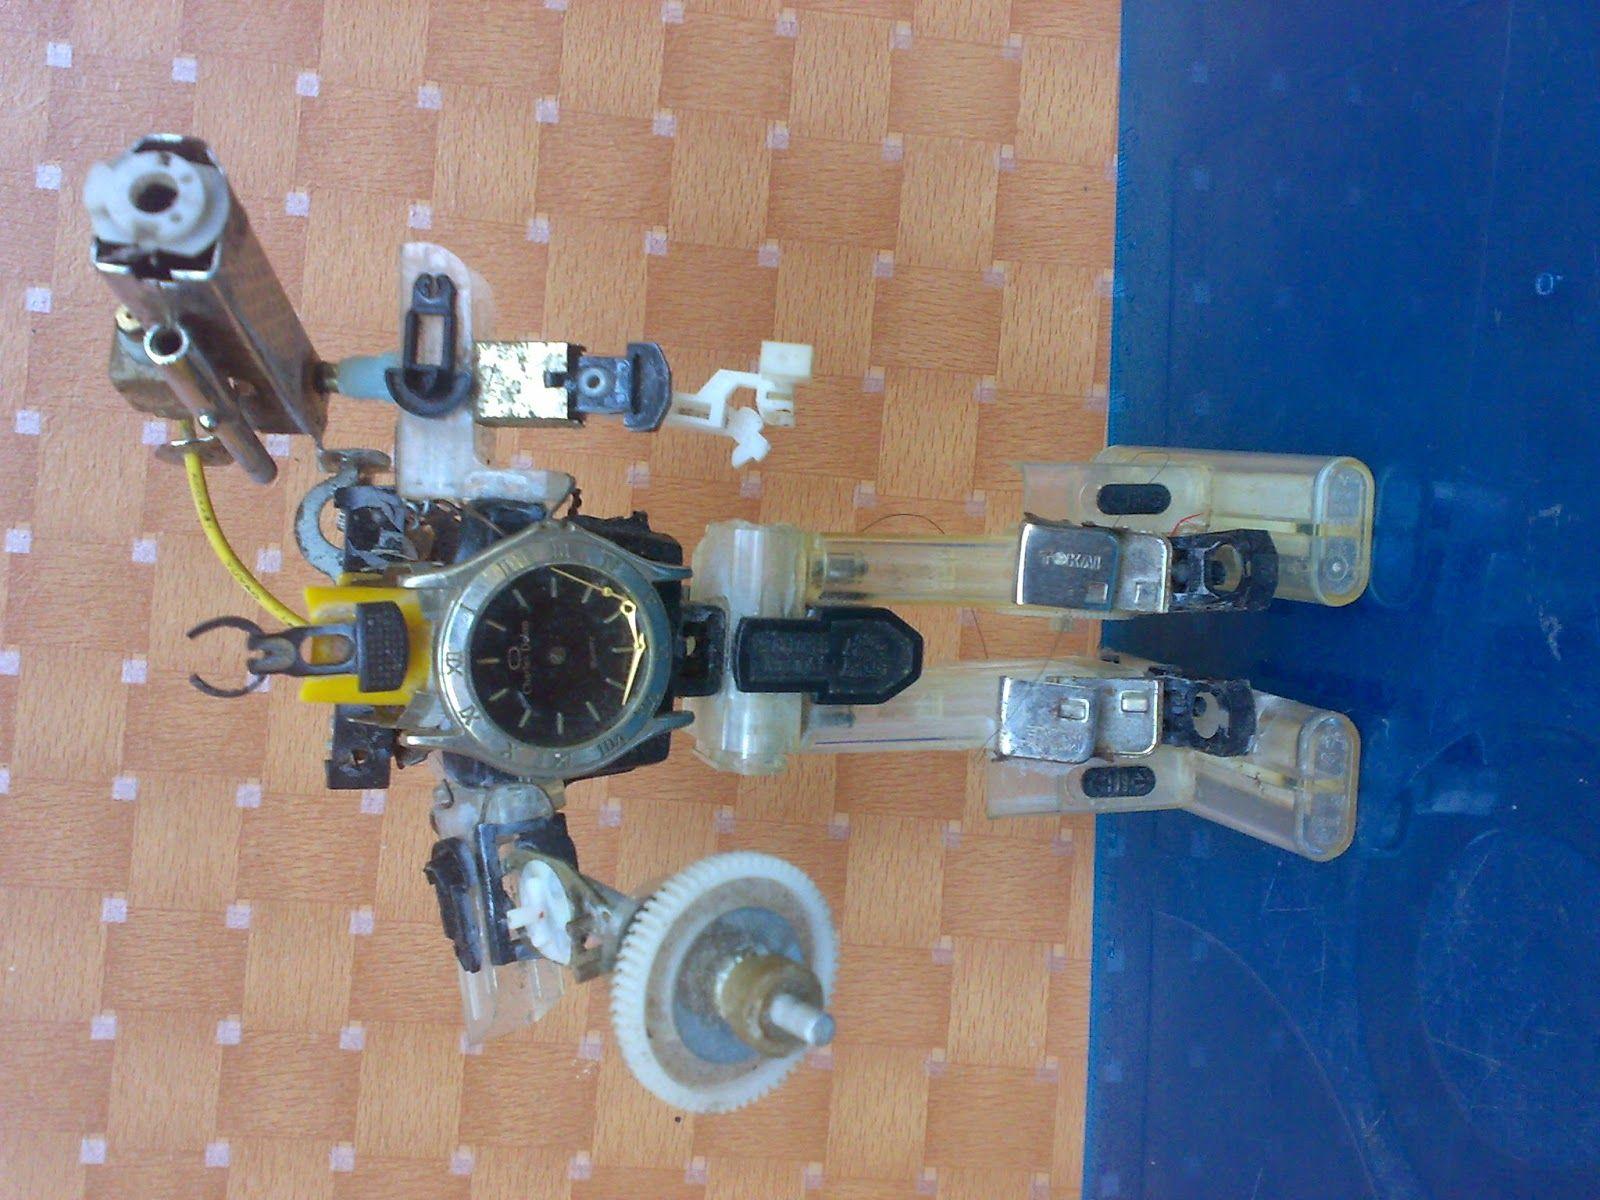 Aneka Miniatur Dari Barang Bekas Must Make Pinterest Light Pcb Sculptures Artist Upcycles Old Circuit Boards Into Art Gas Lights Crafts Lighter Pasta Upcycle